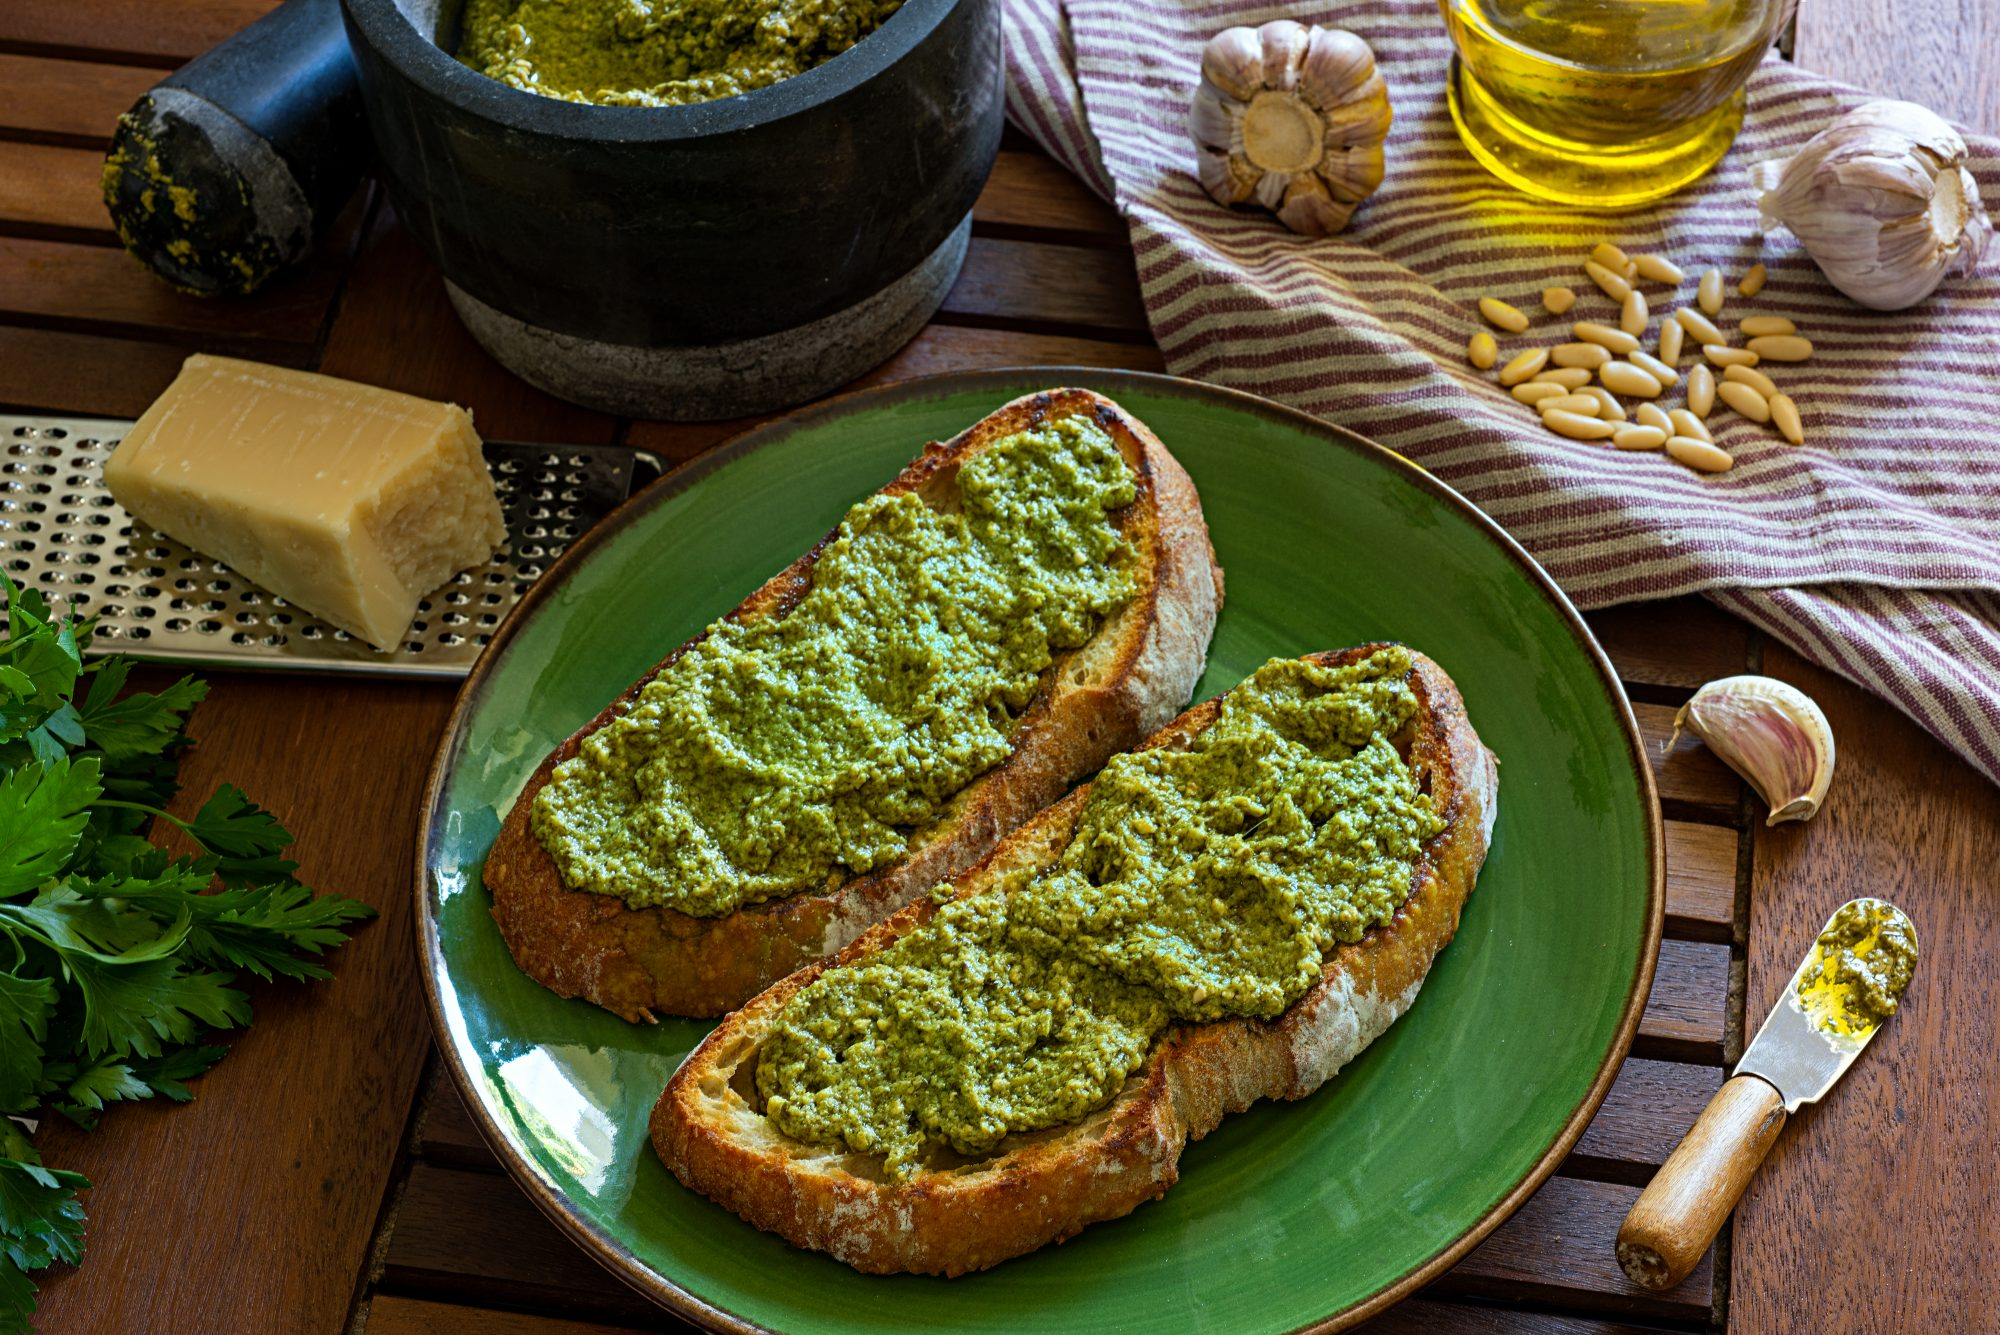 Pesto Spread on Bread